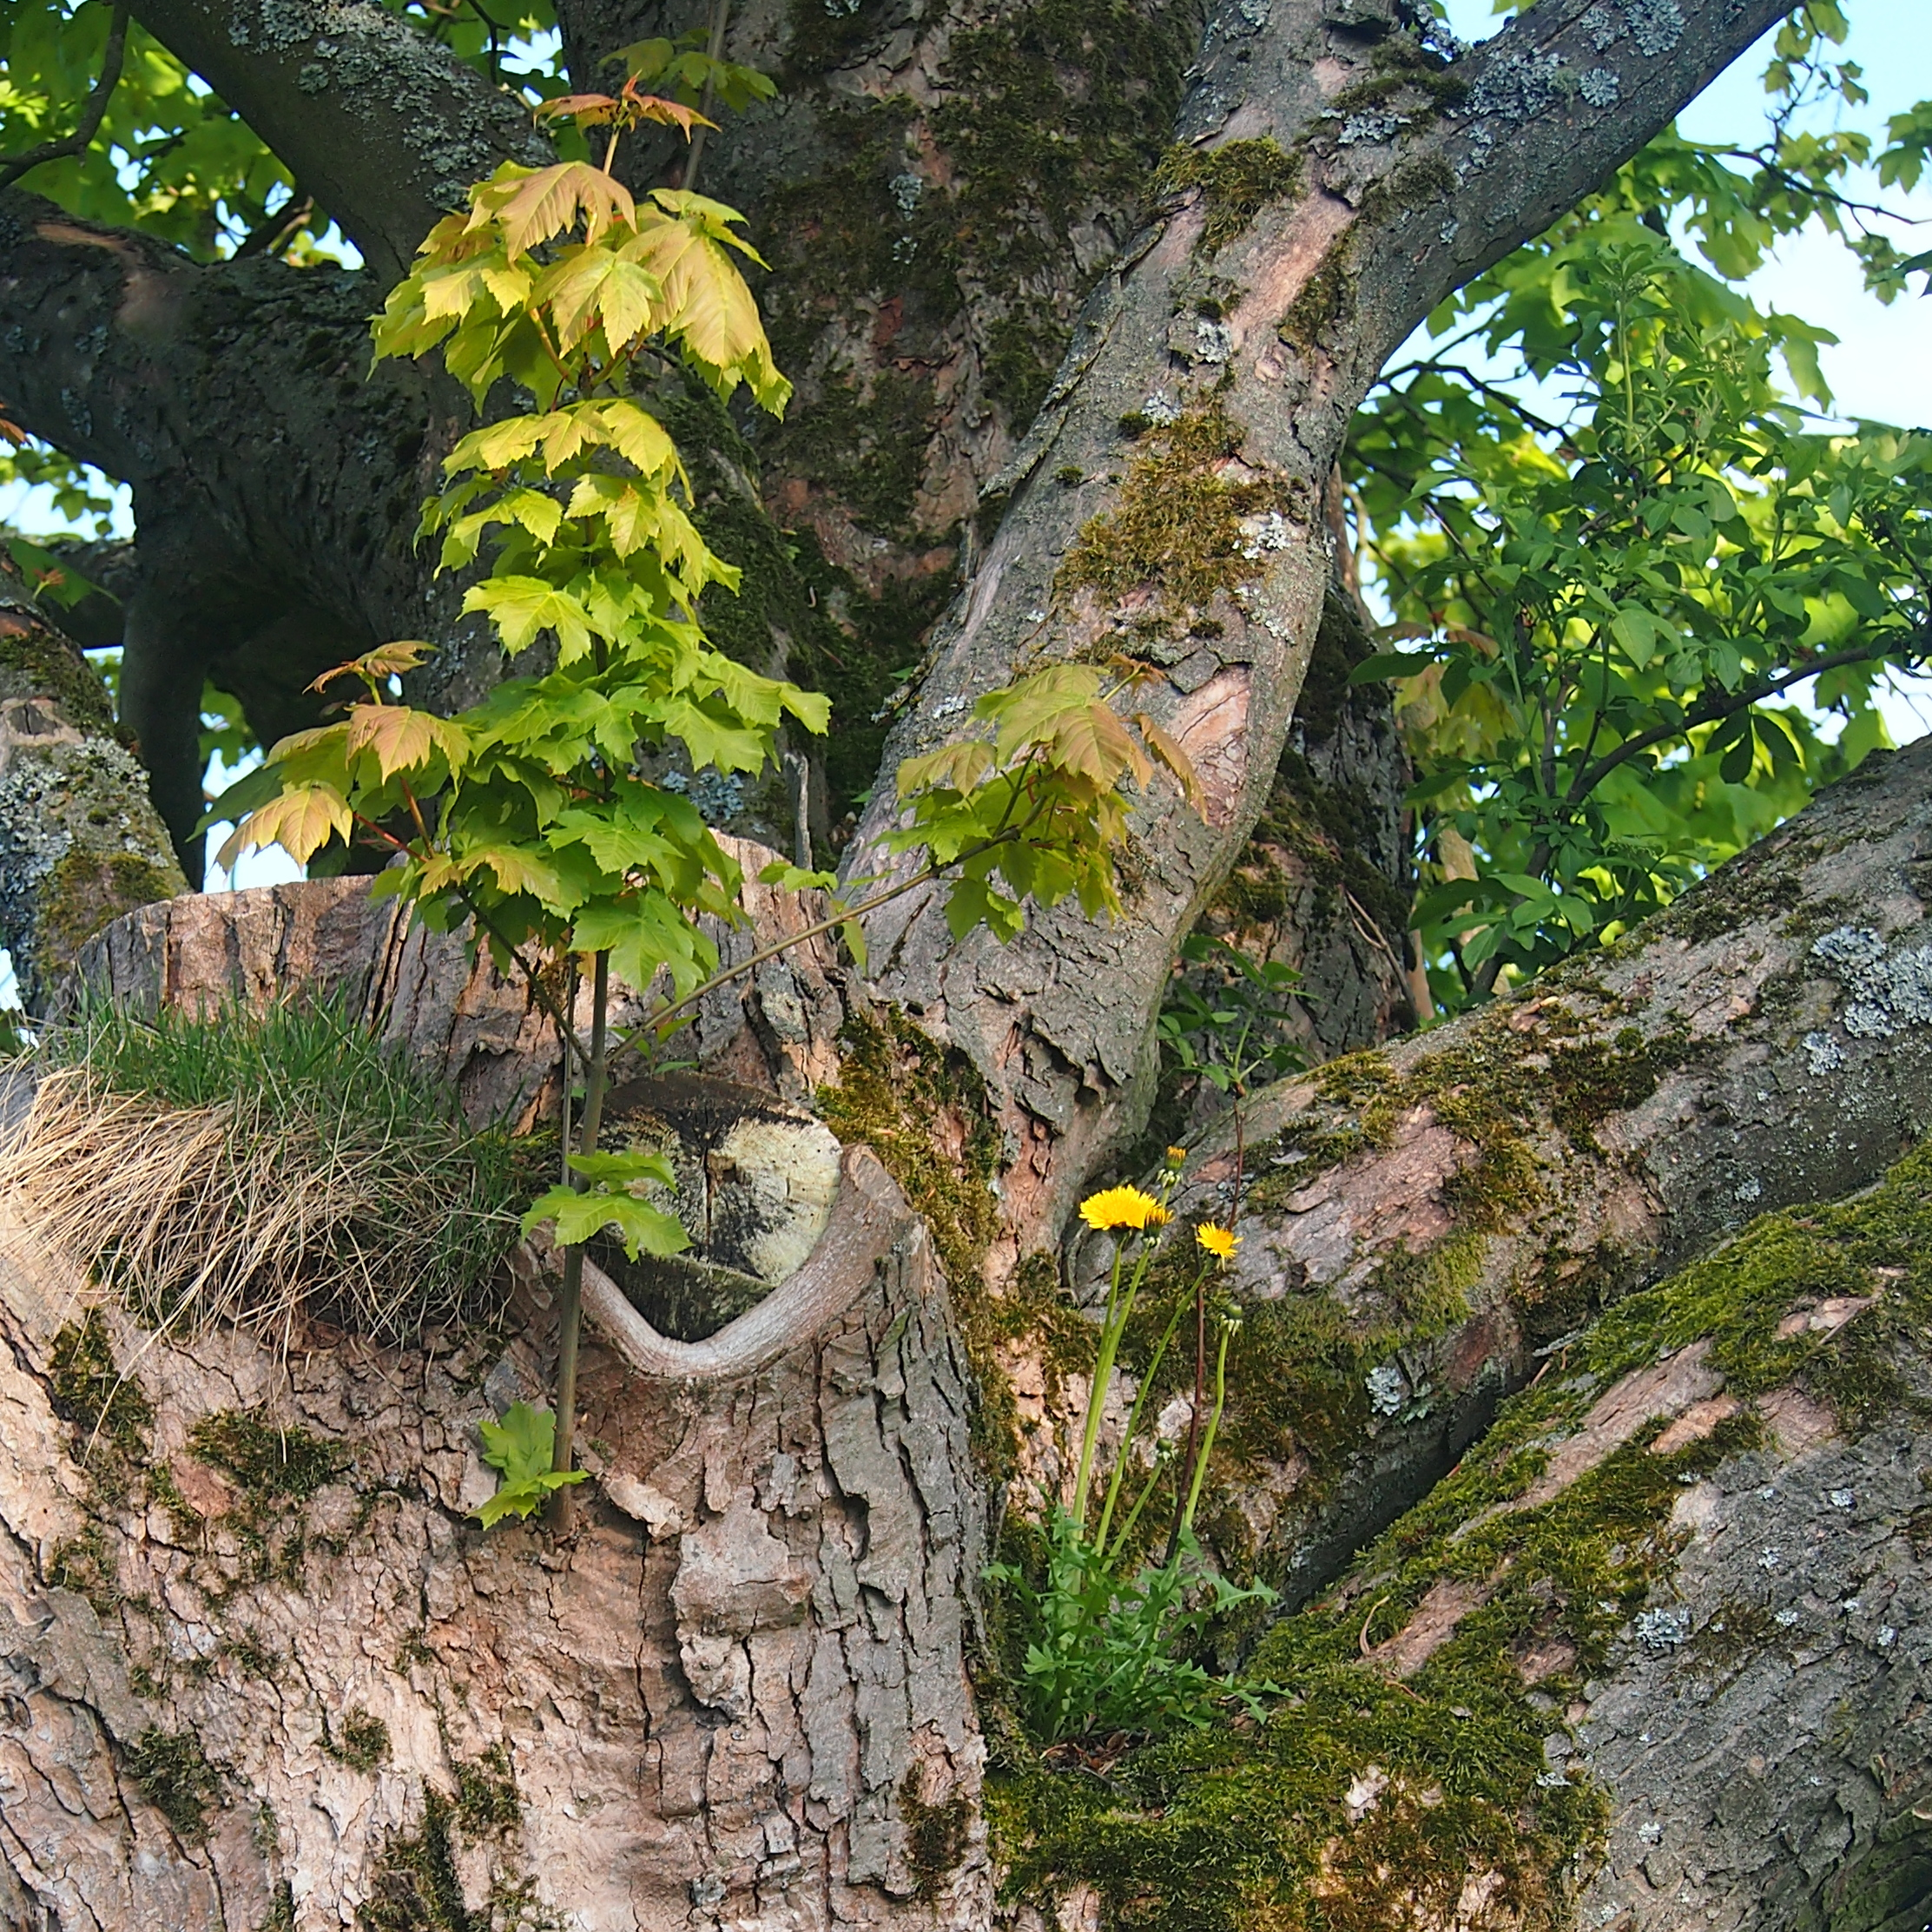 aecco_tree_plants.jpg